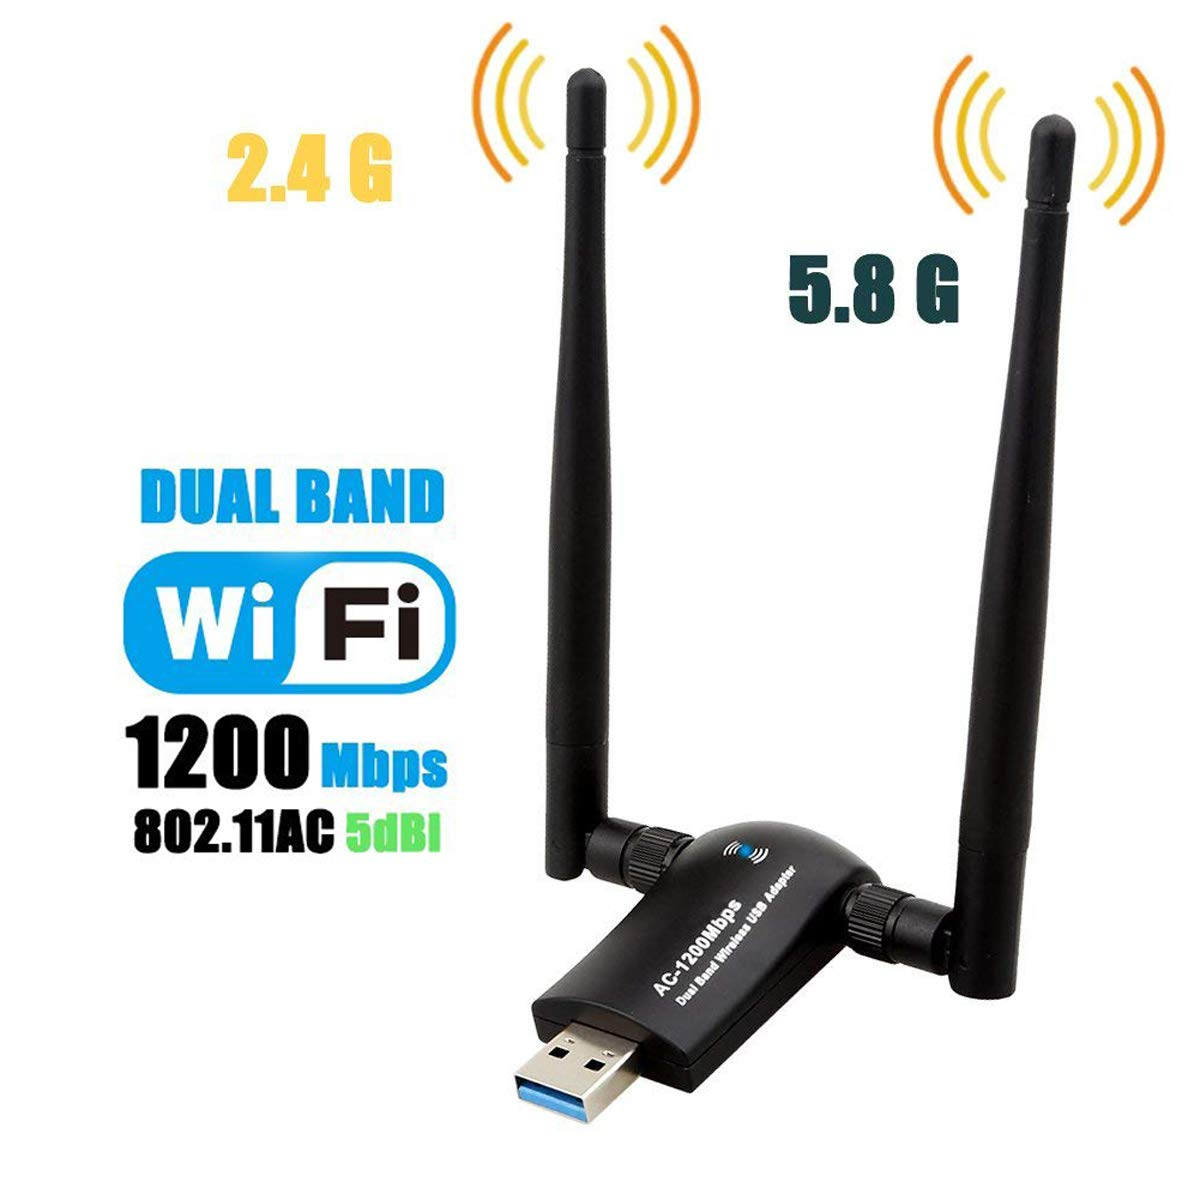 1200Mbps Wireless USB WiFi Adapter, Maxsoco WiFi Adapter,AC1200 Dual Band 802.11 ac/a/b/g/n,2.4GHz/300Mbps 5GHz/867Mbps High Gain Dual 2 X 5dBi Antennas Network WiFi USB 3.0 for Desktop (Black) by Maxsoco (Image #1)